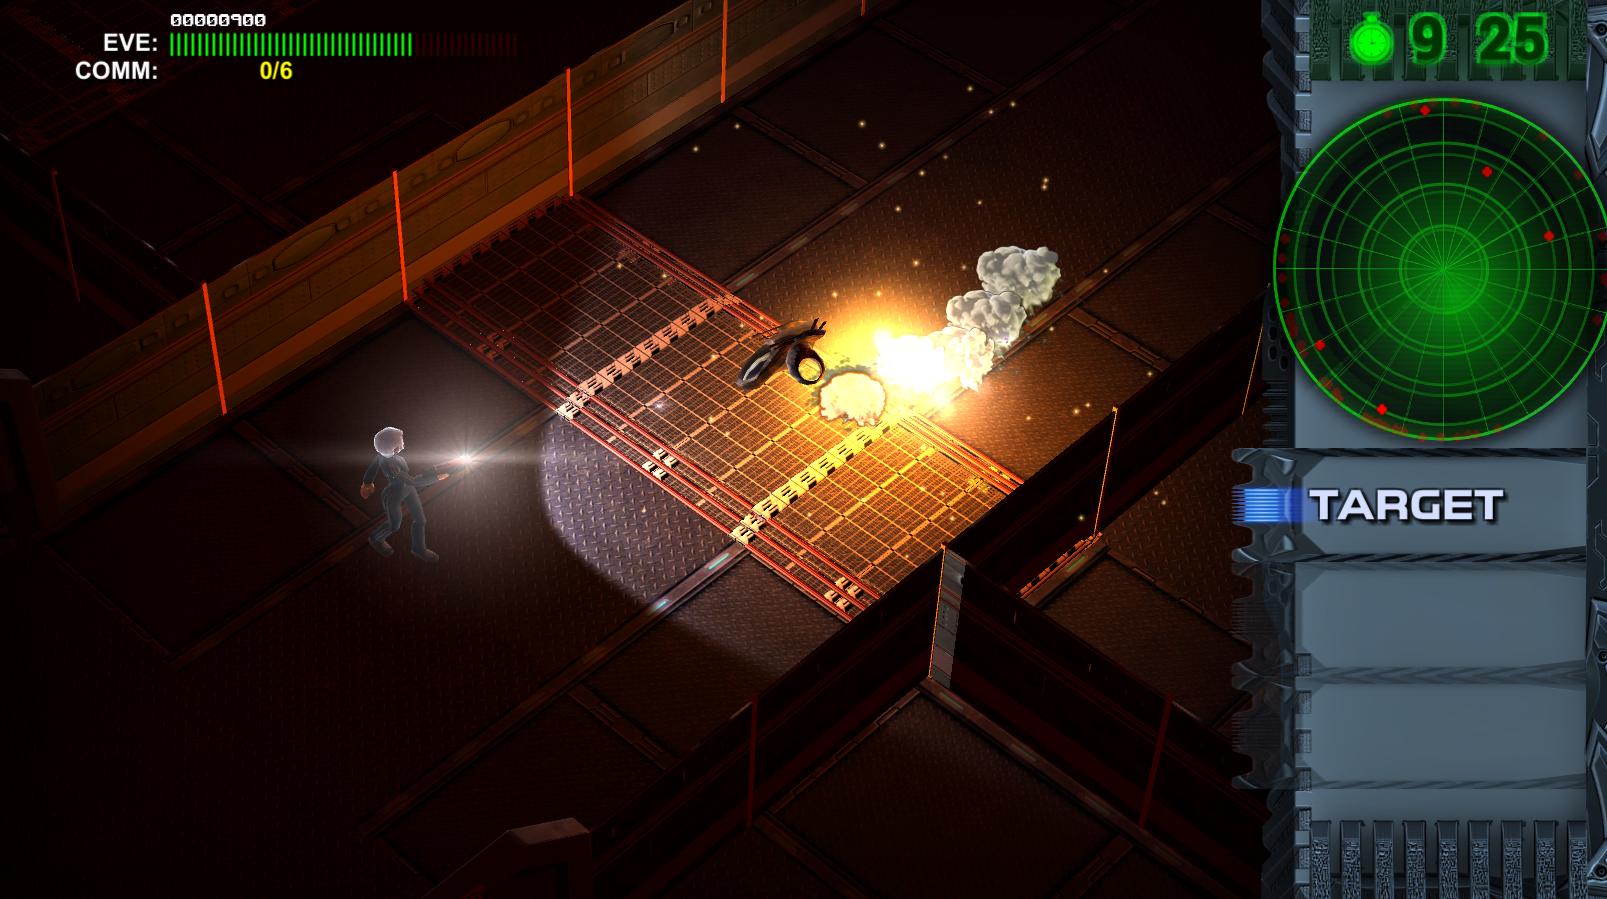 Panther Sci-Fi Isometric Adventure Cyberpunk